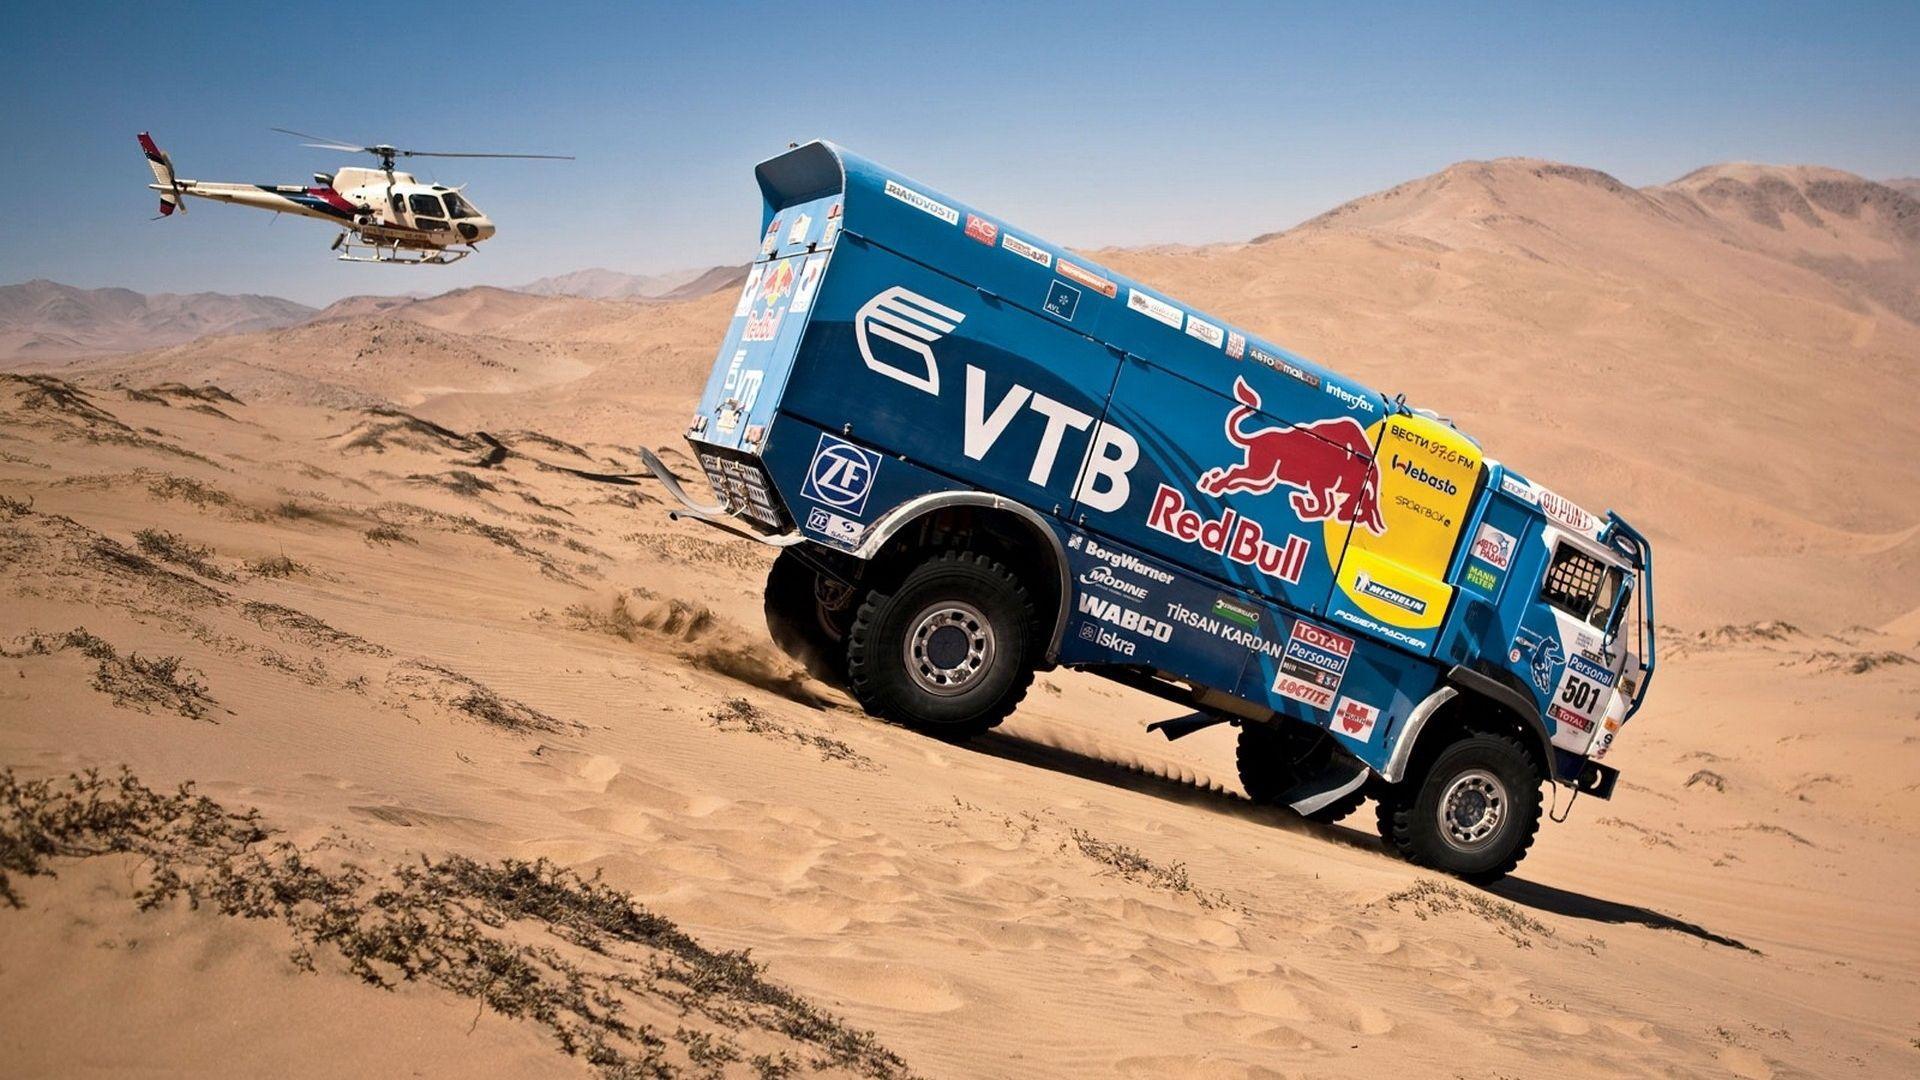 Awesome Truck Rally Dakar Wallpaper #1742 Wallpaper Themes ...